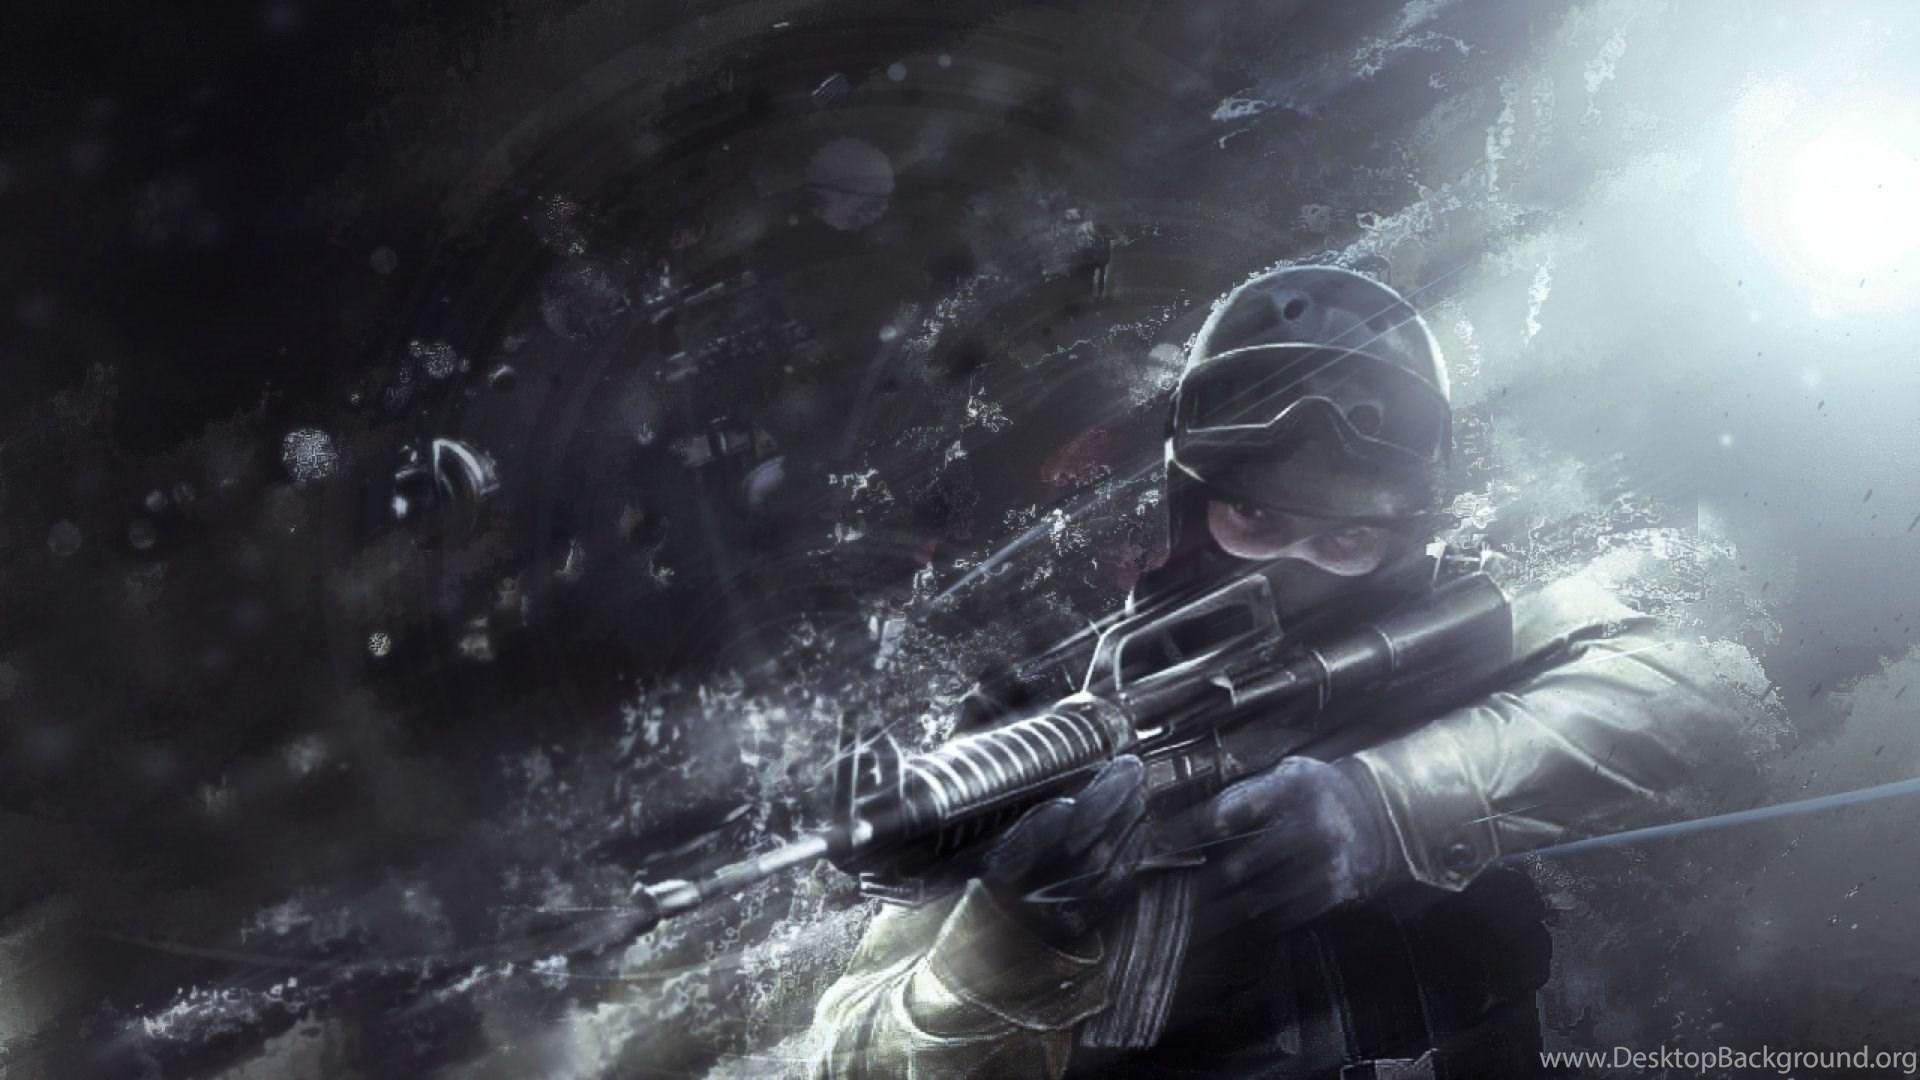 Full Hd 1080p Counter Strike Wallpapers Jpg Desktop Background